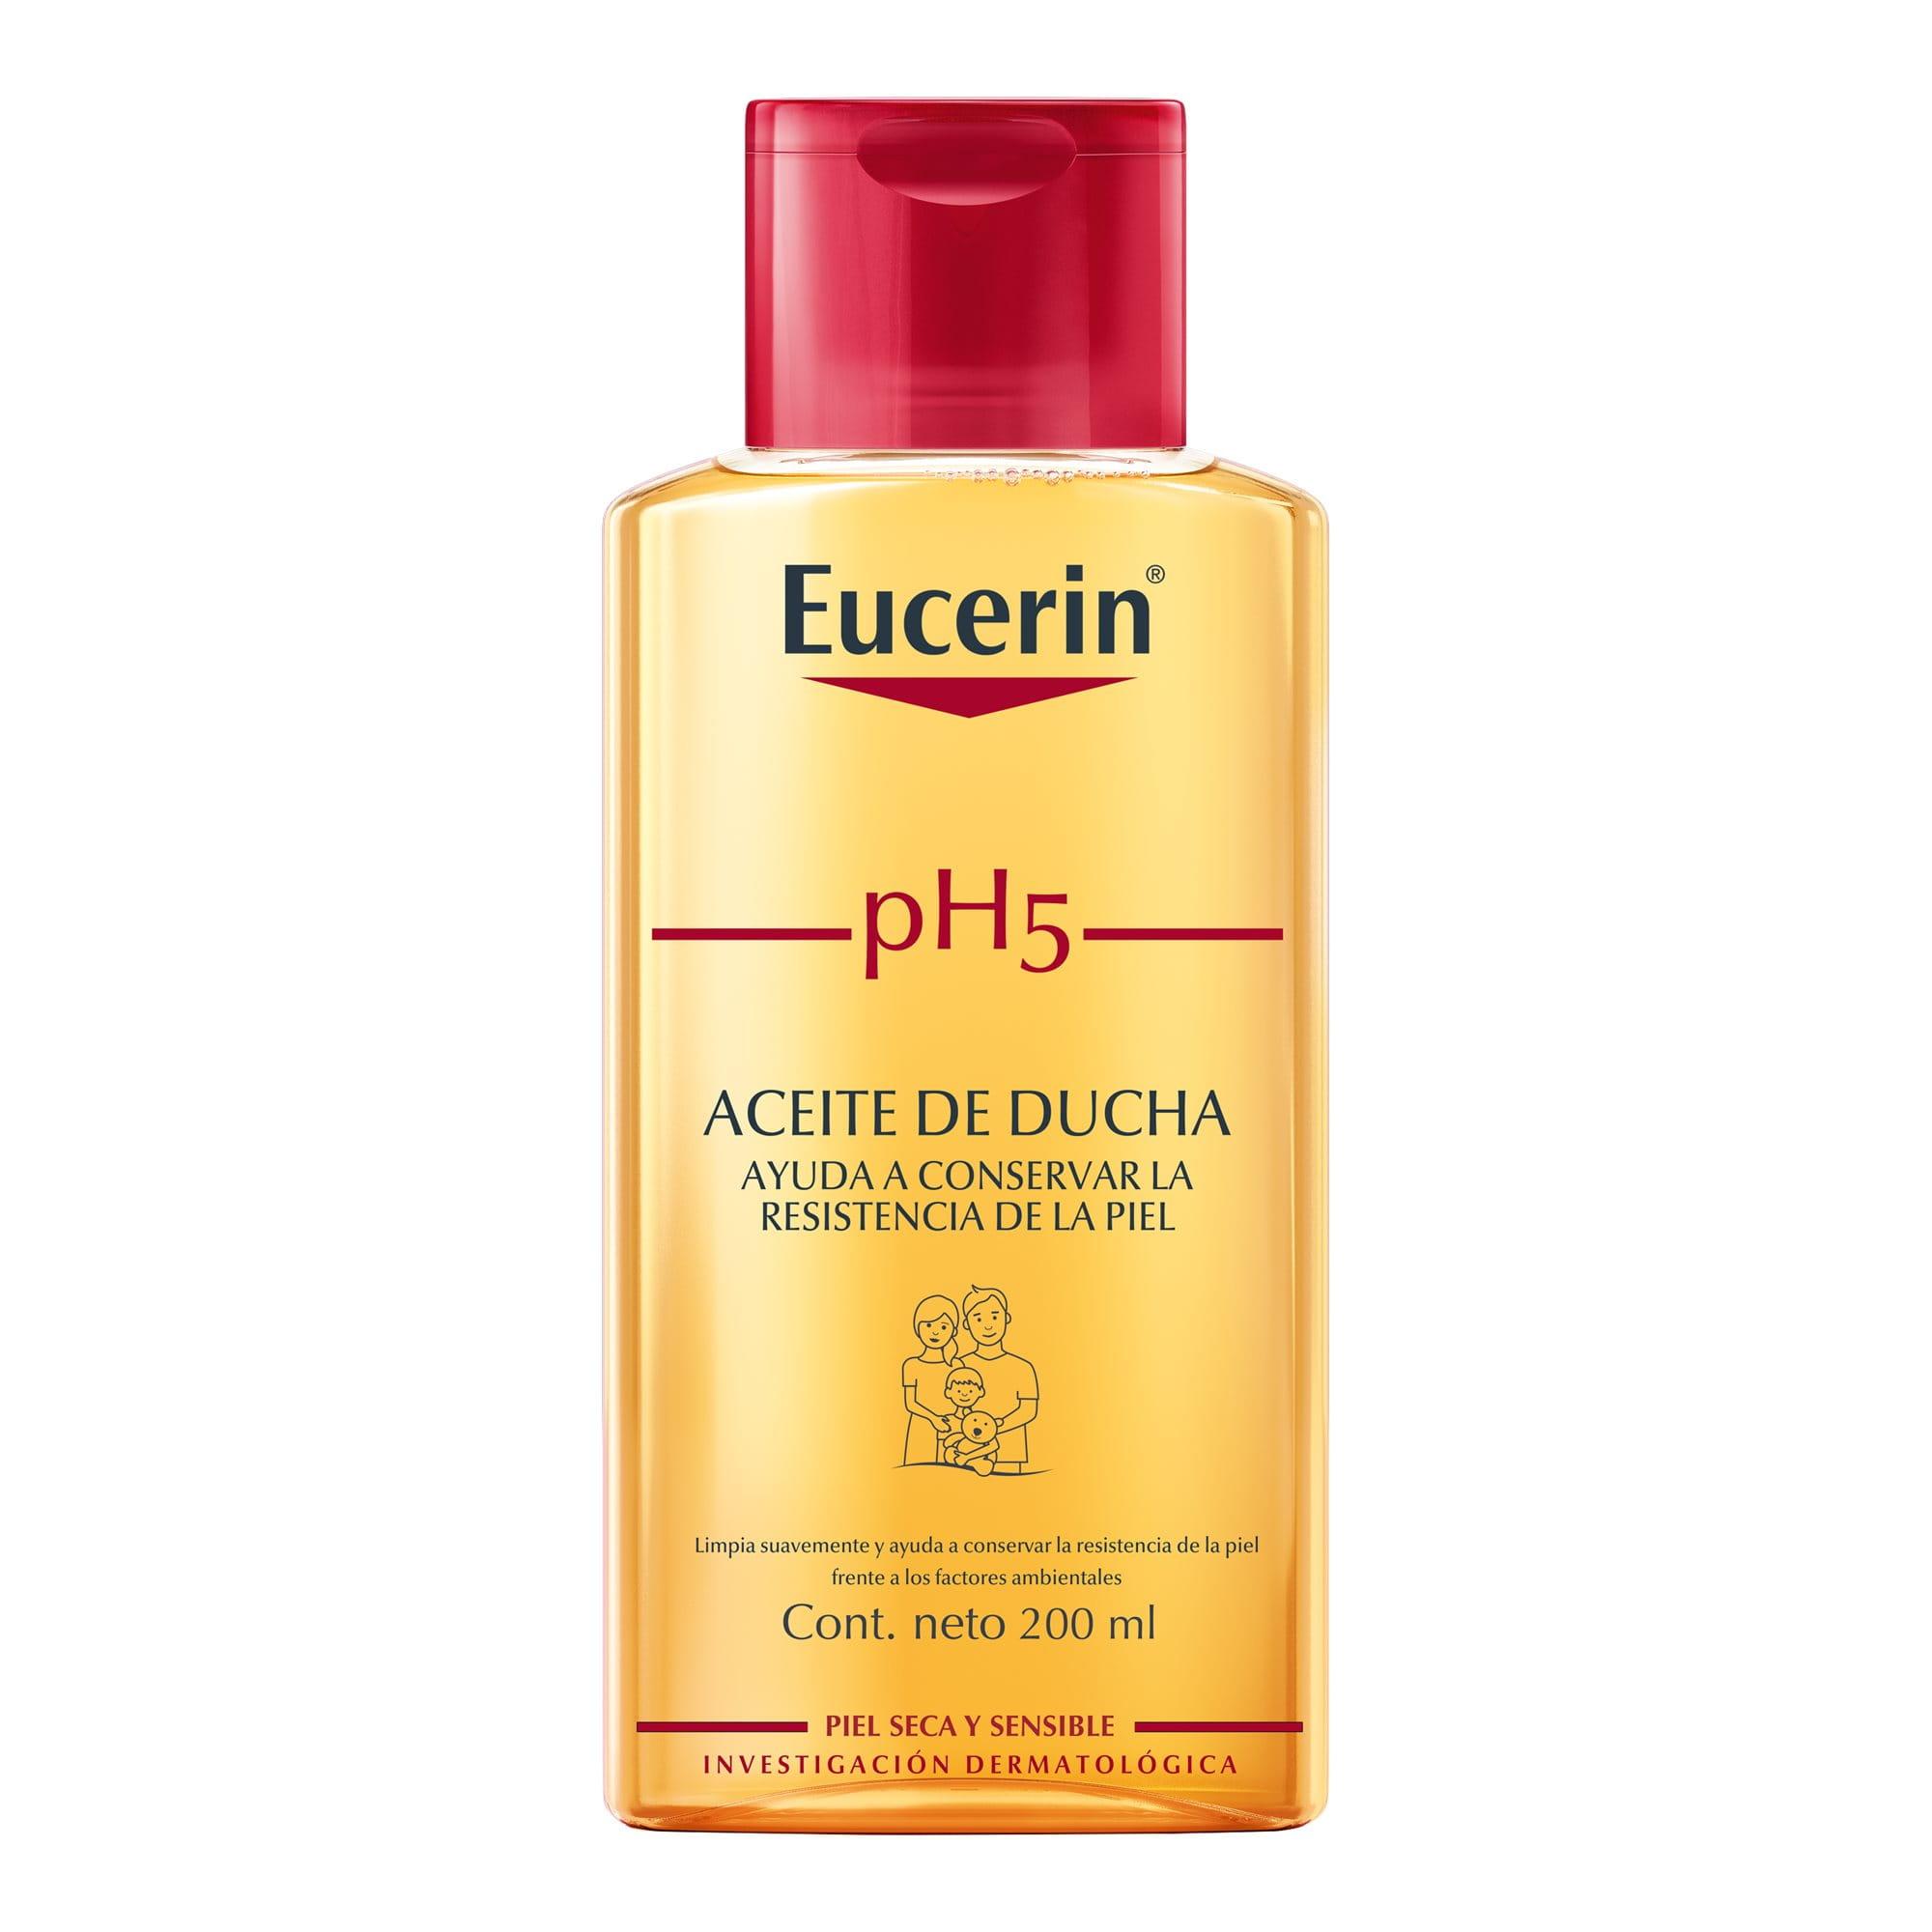 63121_Eucerin-PH5-aceite-de-ducha-200ml_packshot